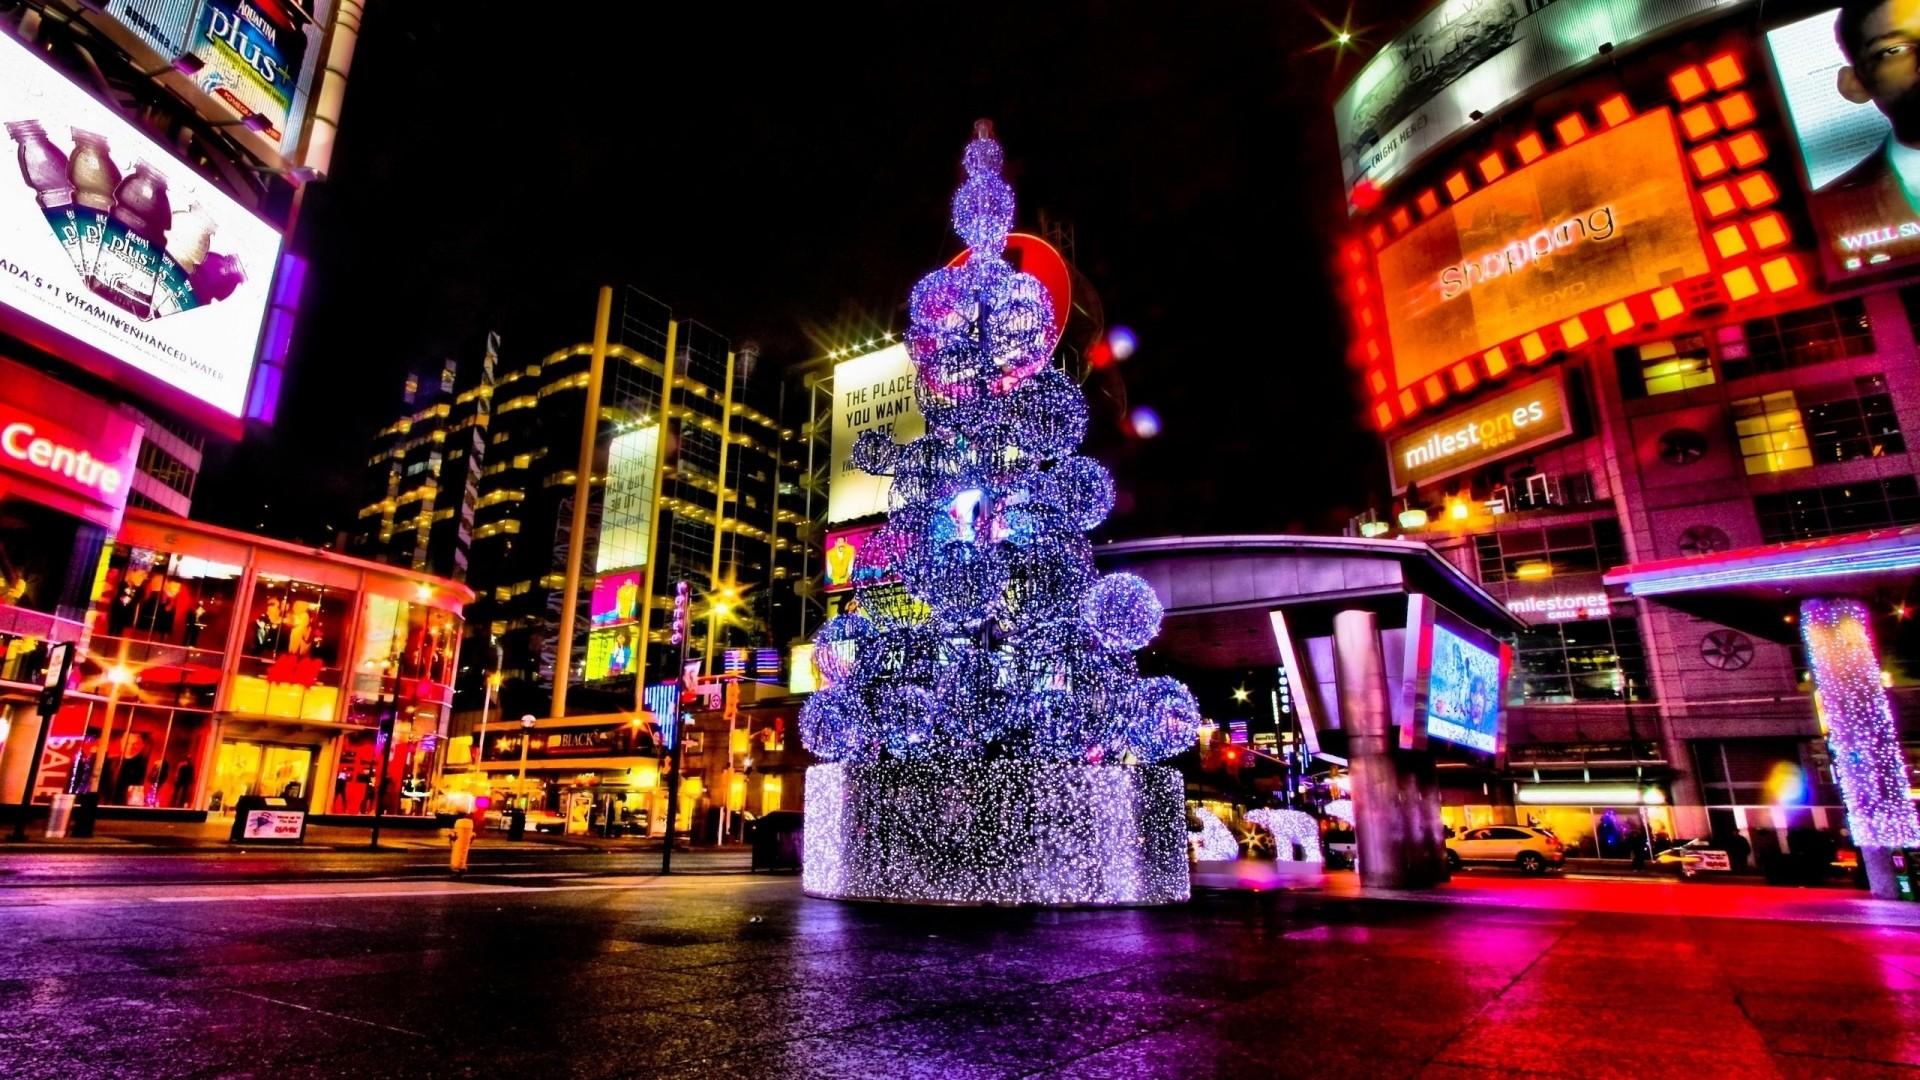 Wallpaper christmas, holiday, tree, street, night, area